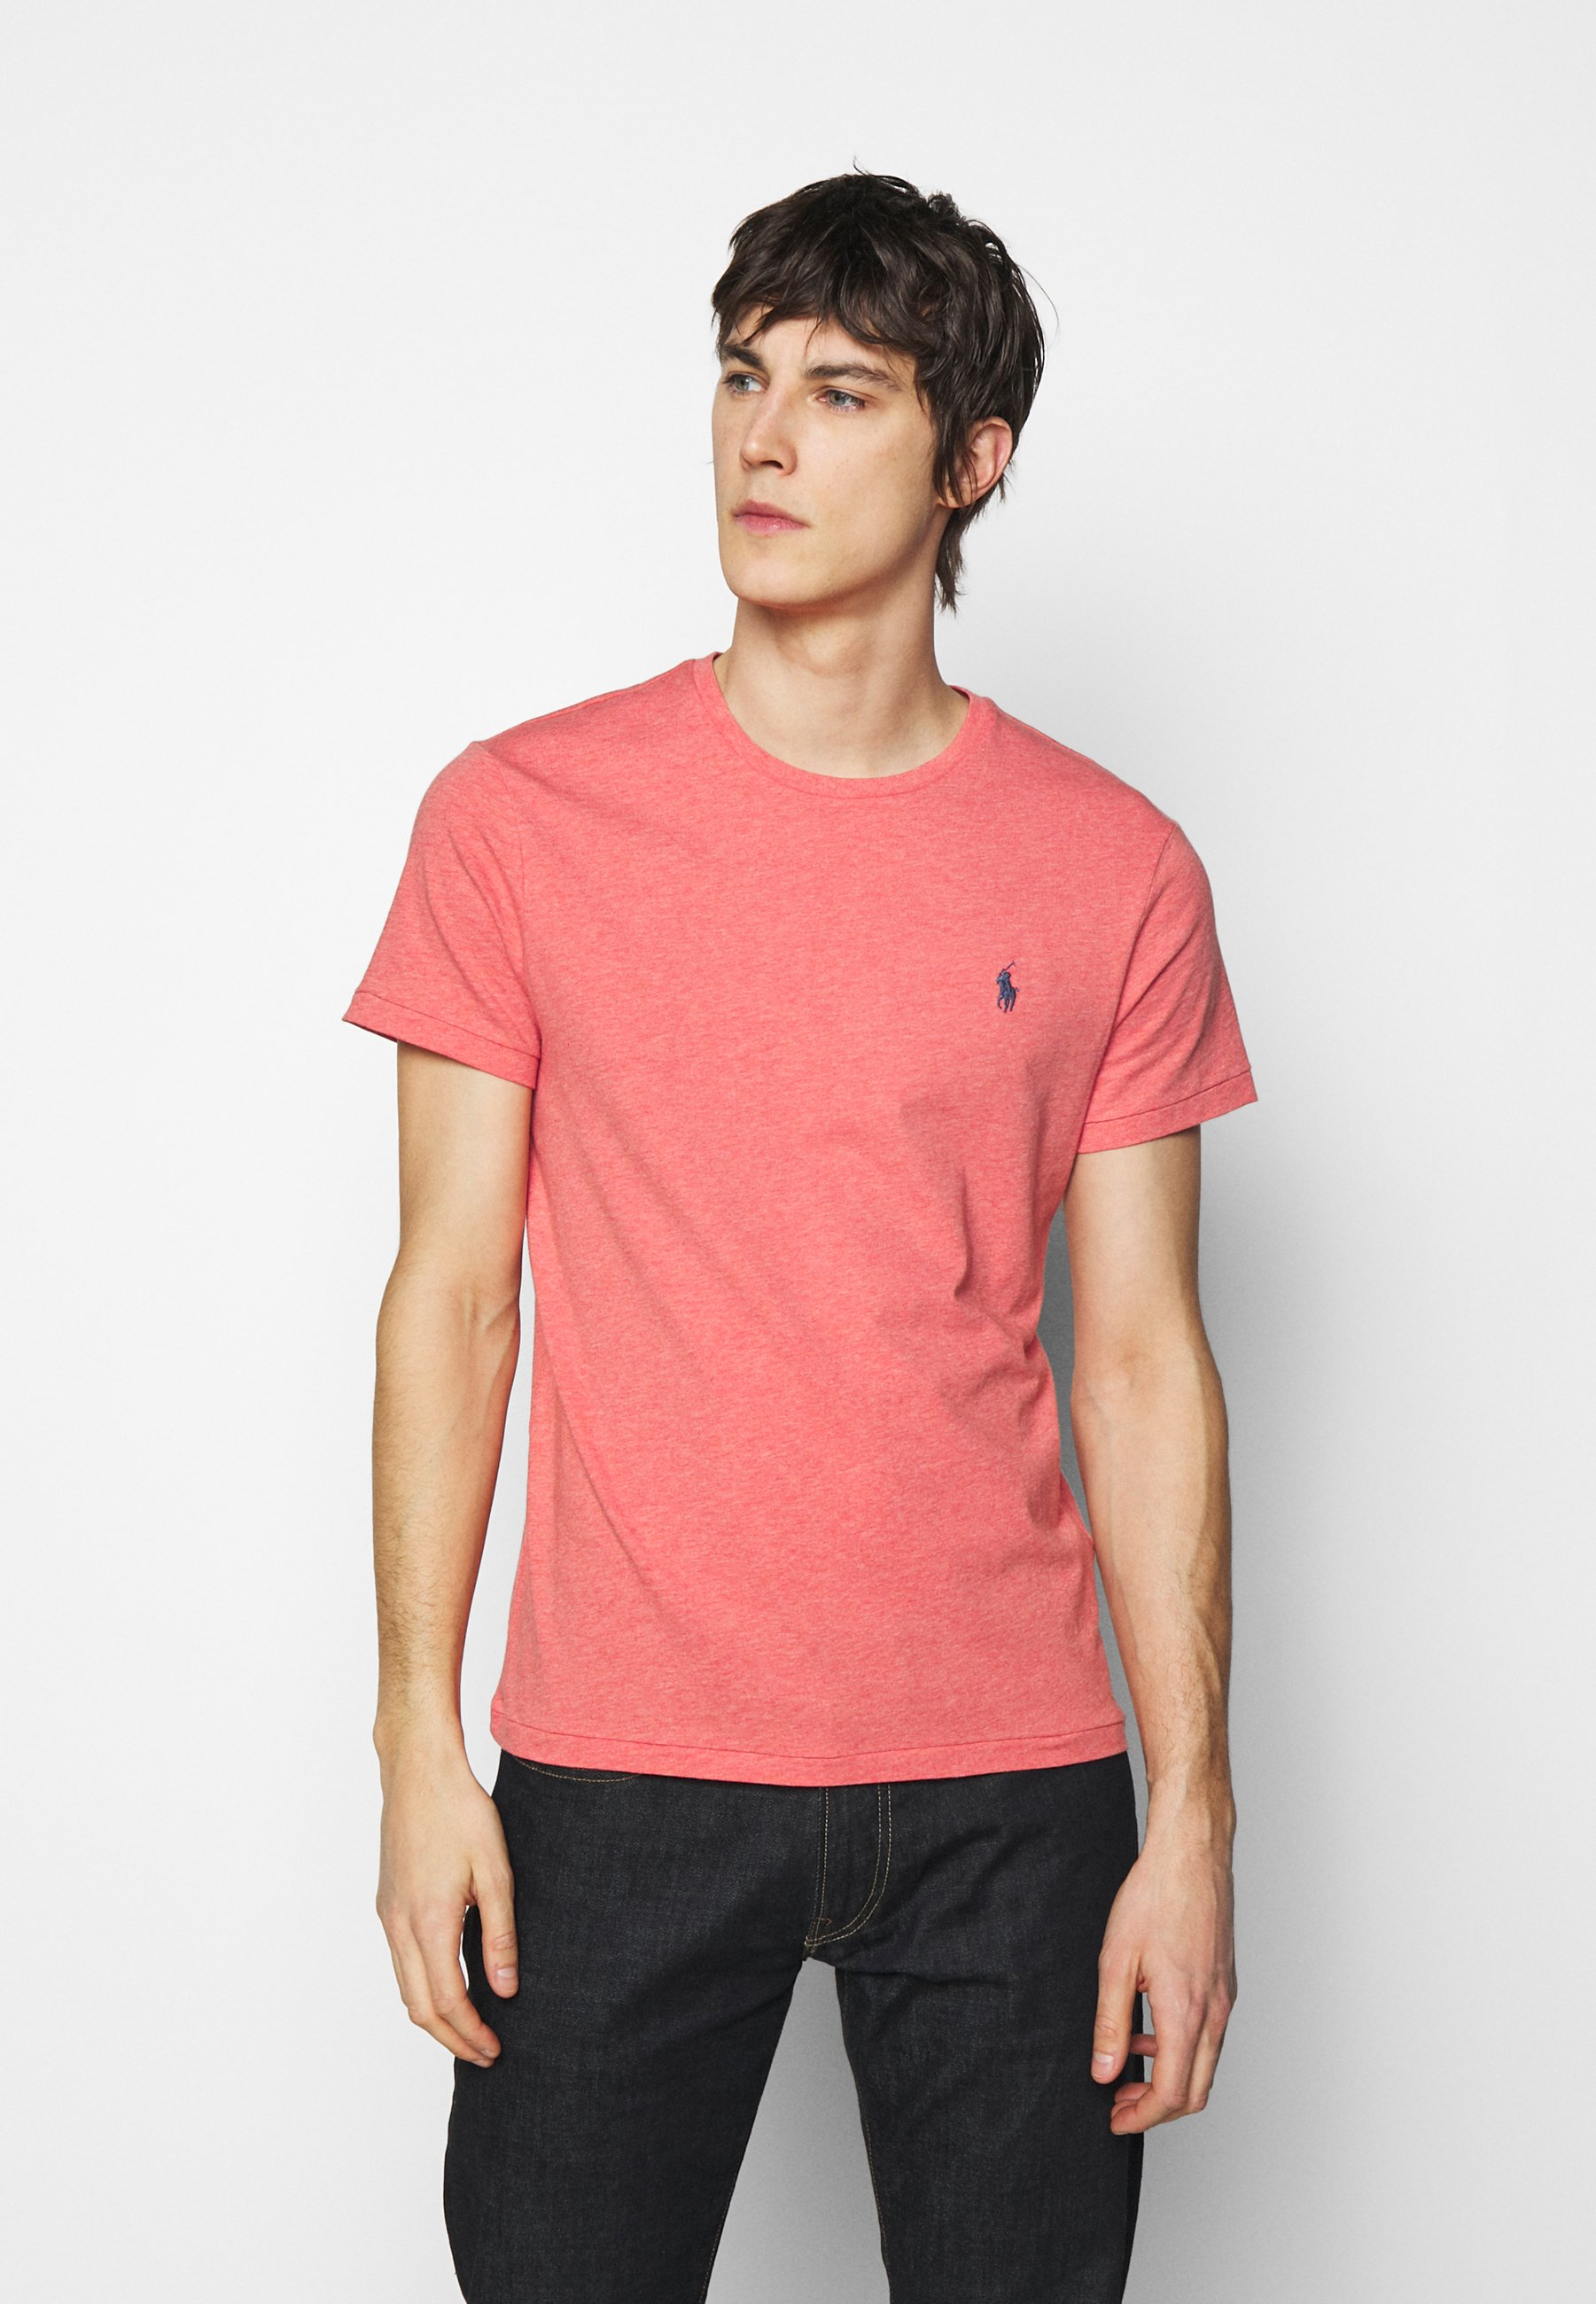 Homme CUSTOM SLIM FIT JERSEY CREWNECK T-SHIRT - T-shirt basique